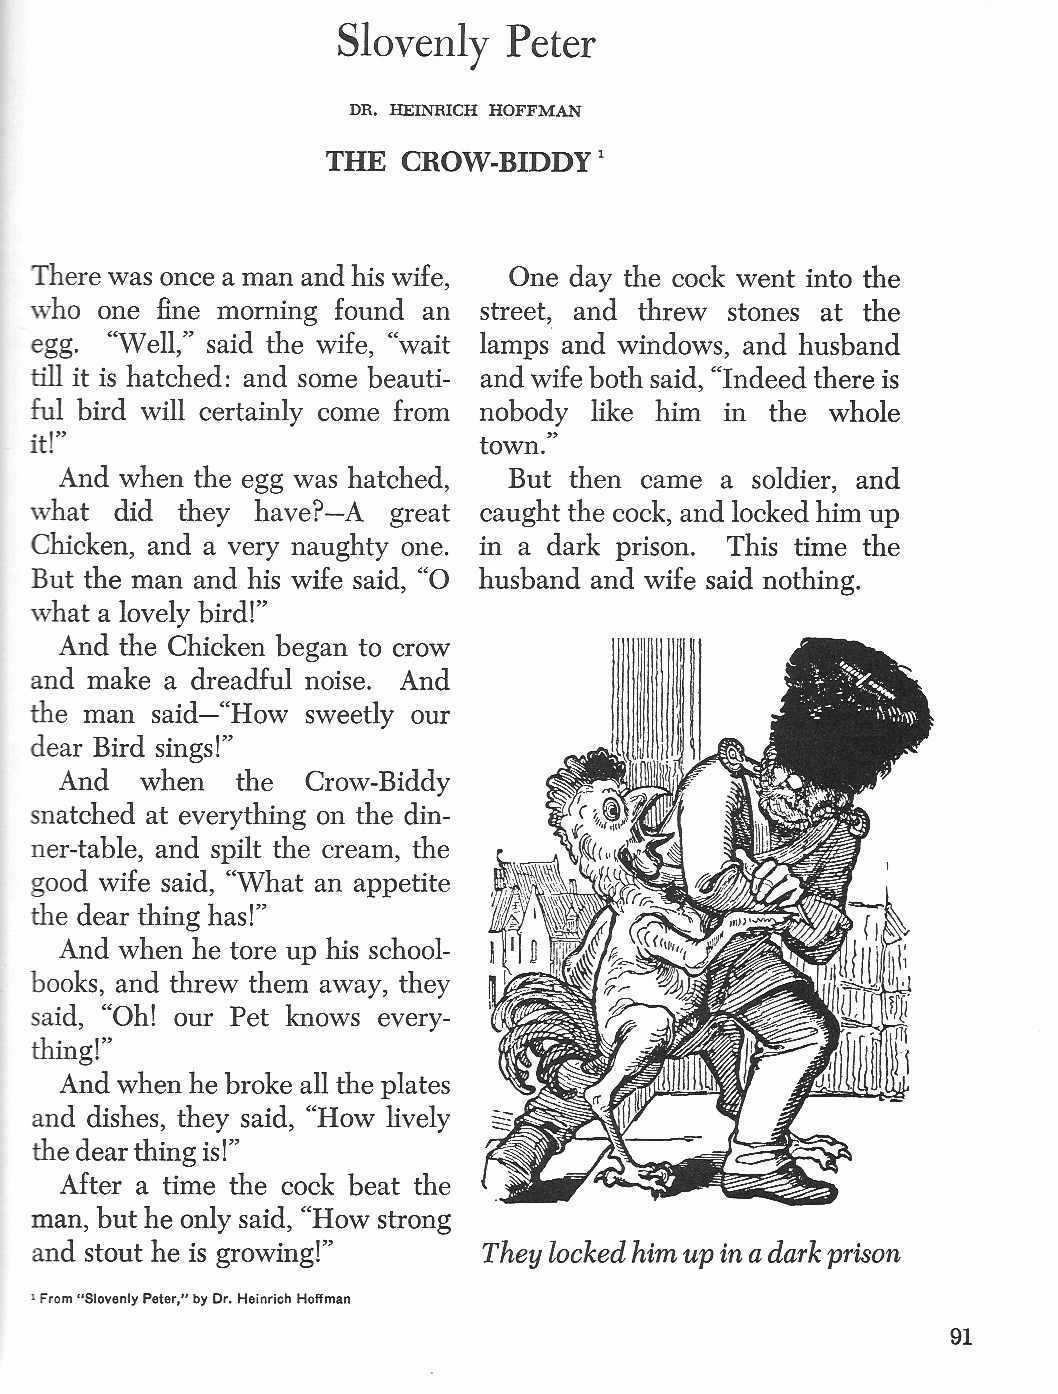 Worksheets Image Of Short Story For Kid short stories for kids online matttroy printables image of story kid funny johnnie wyatt blog best